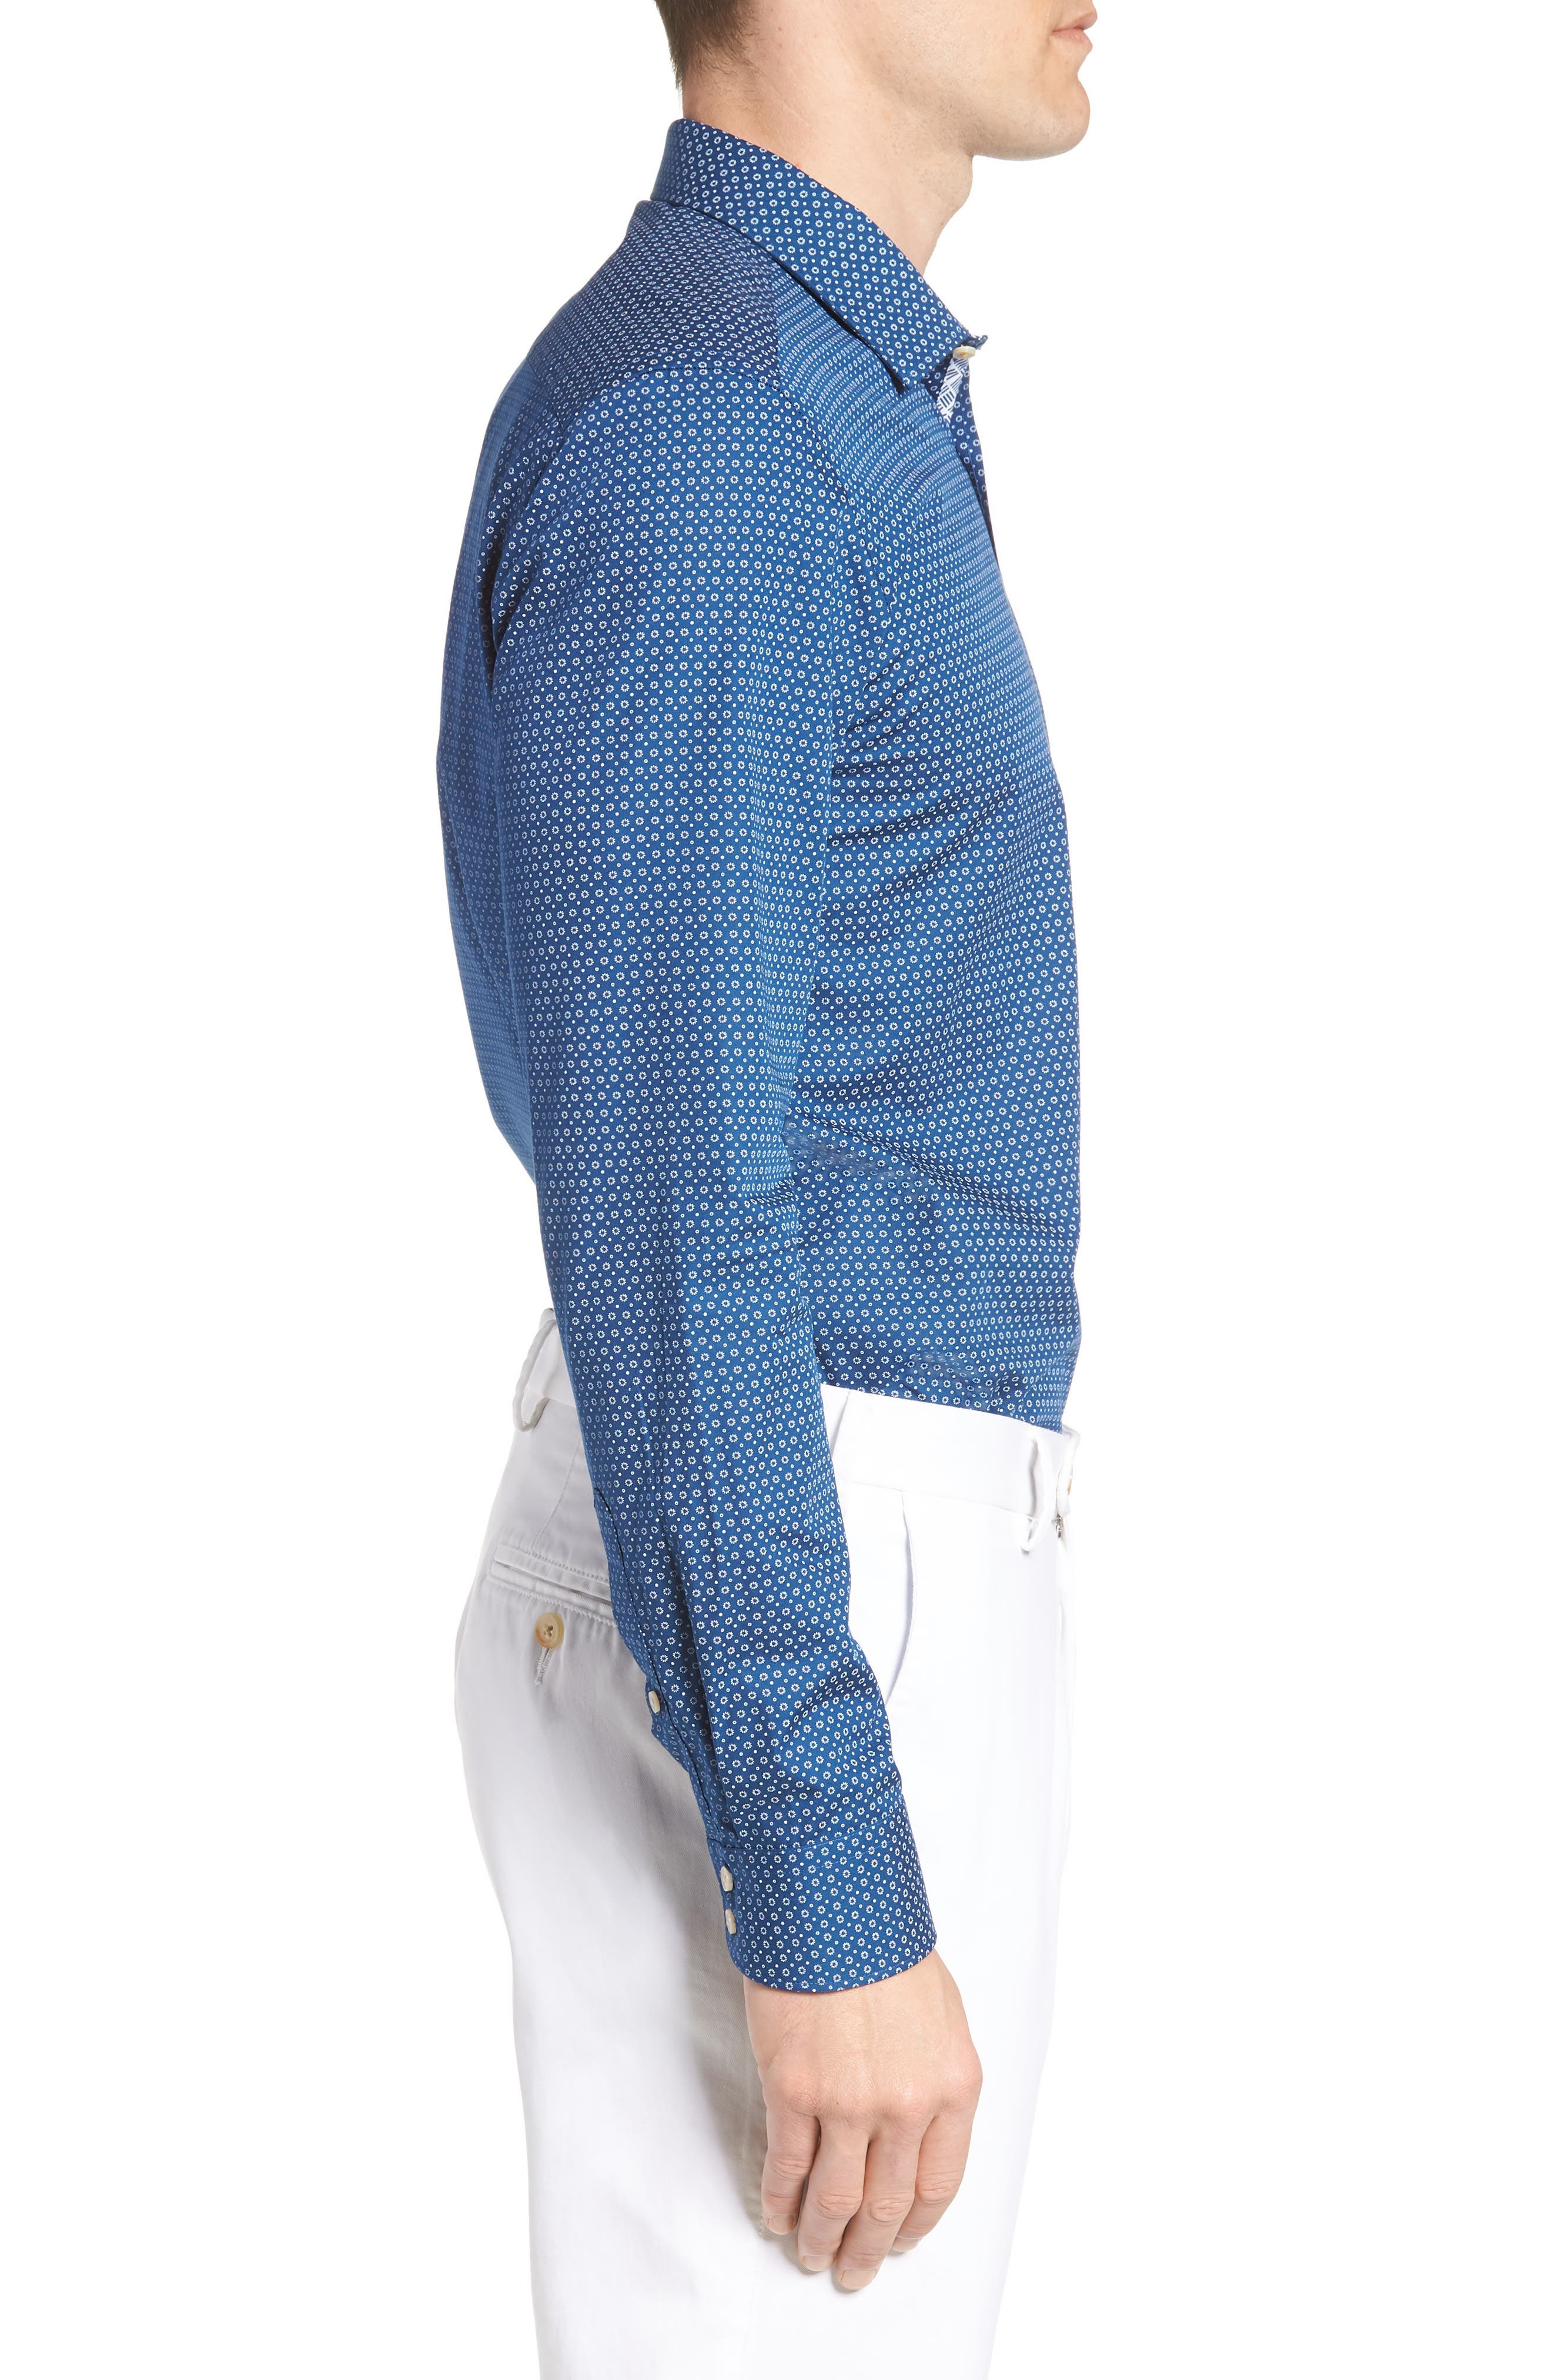 Loops Slim Fit Dress Shirt,                             Alternate thumbnail 3, color,                             Navy